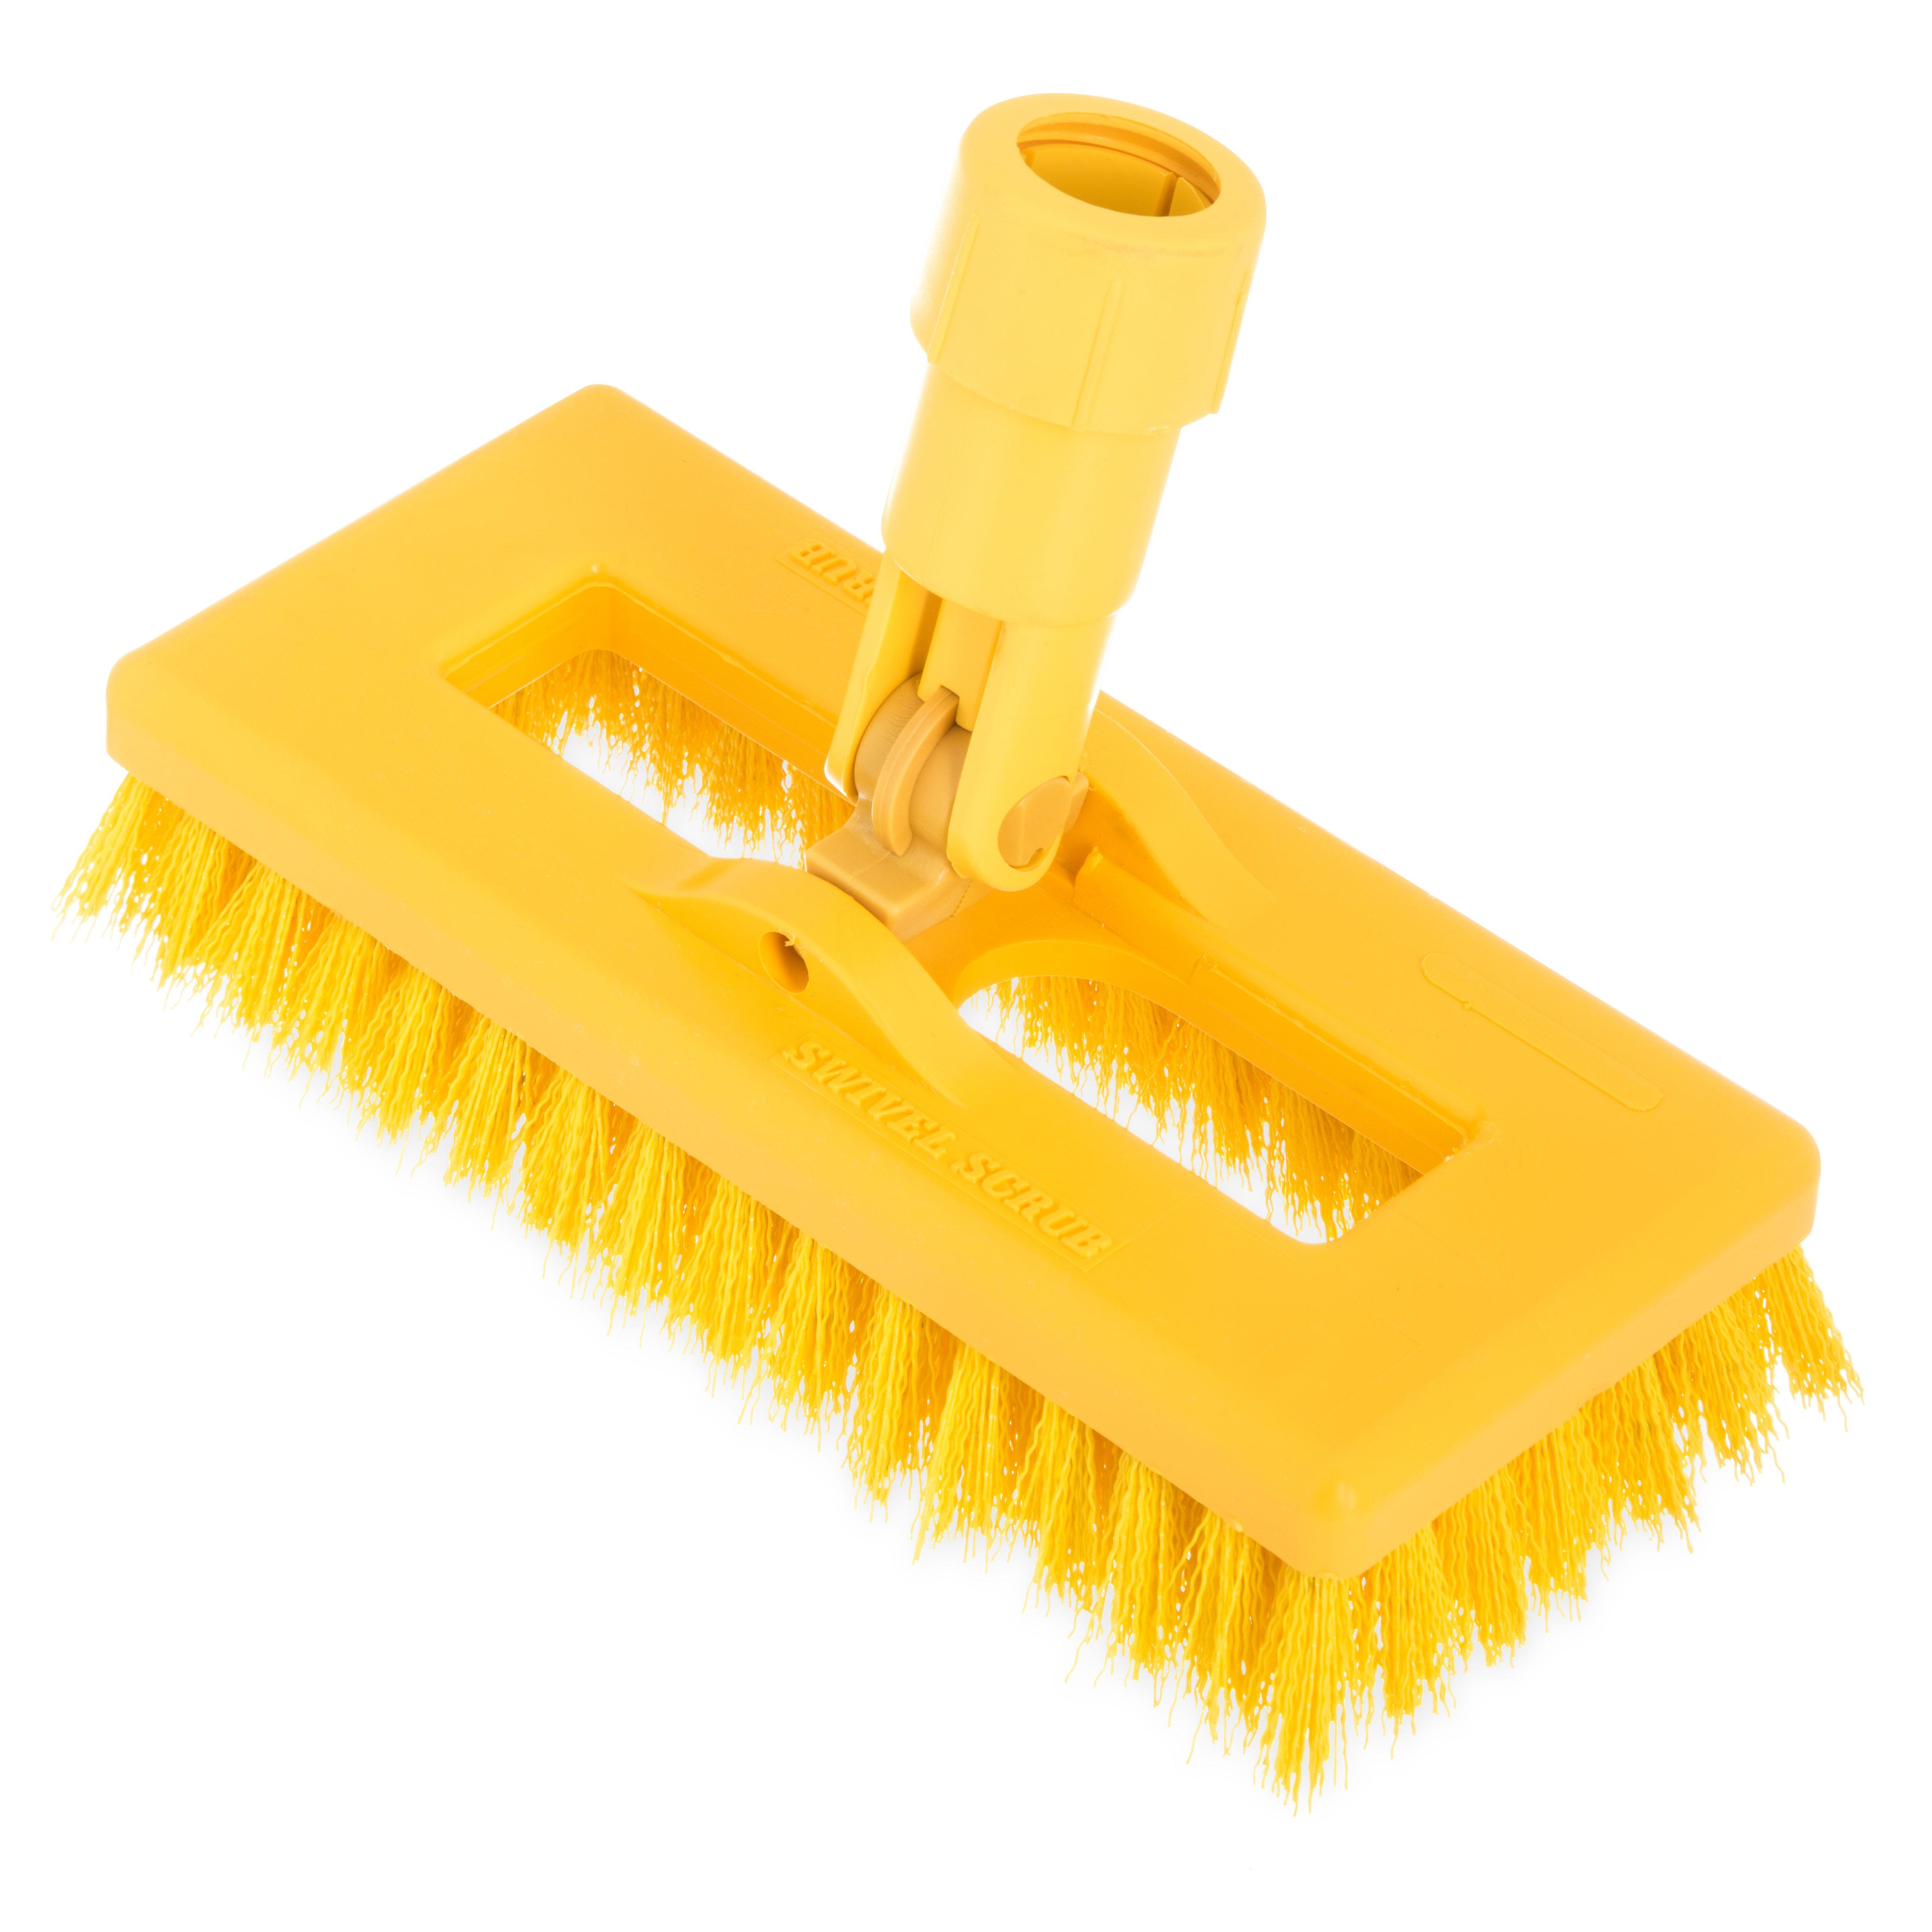 Carlisle 3638831C04 brush, floor